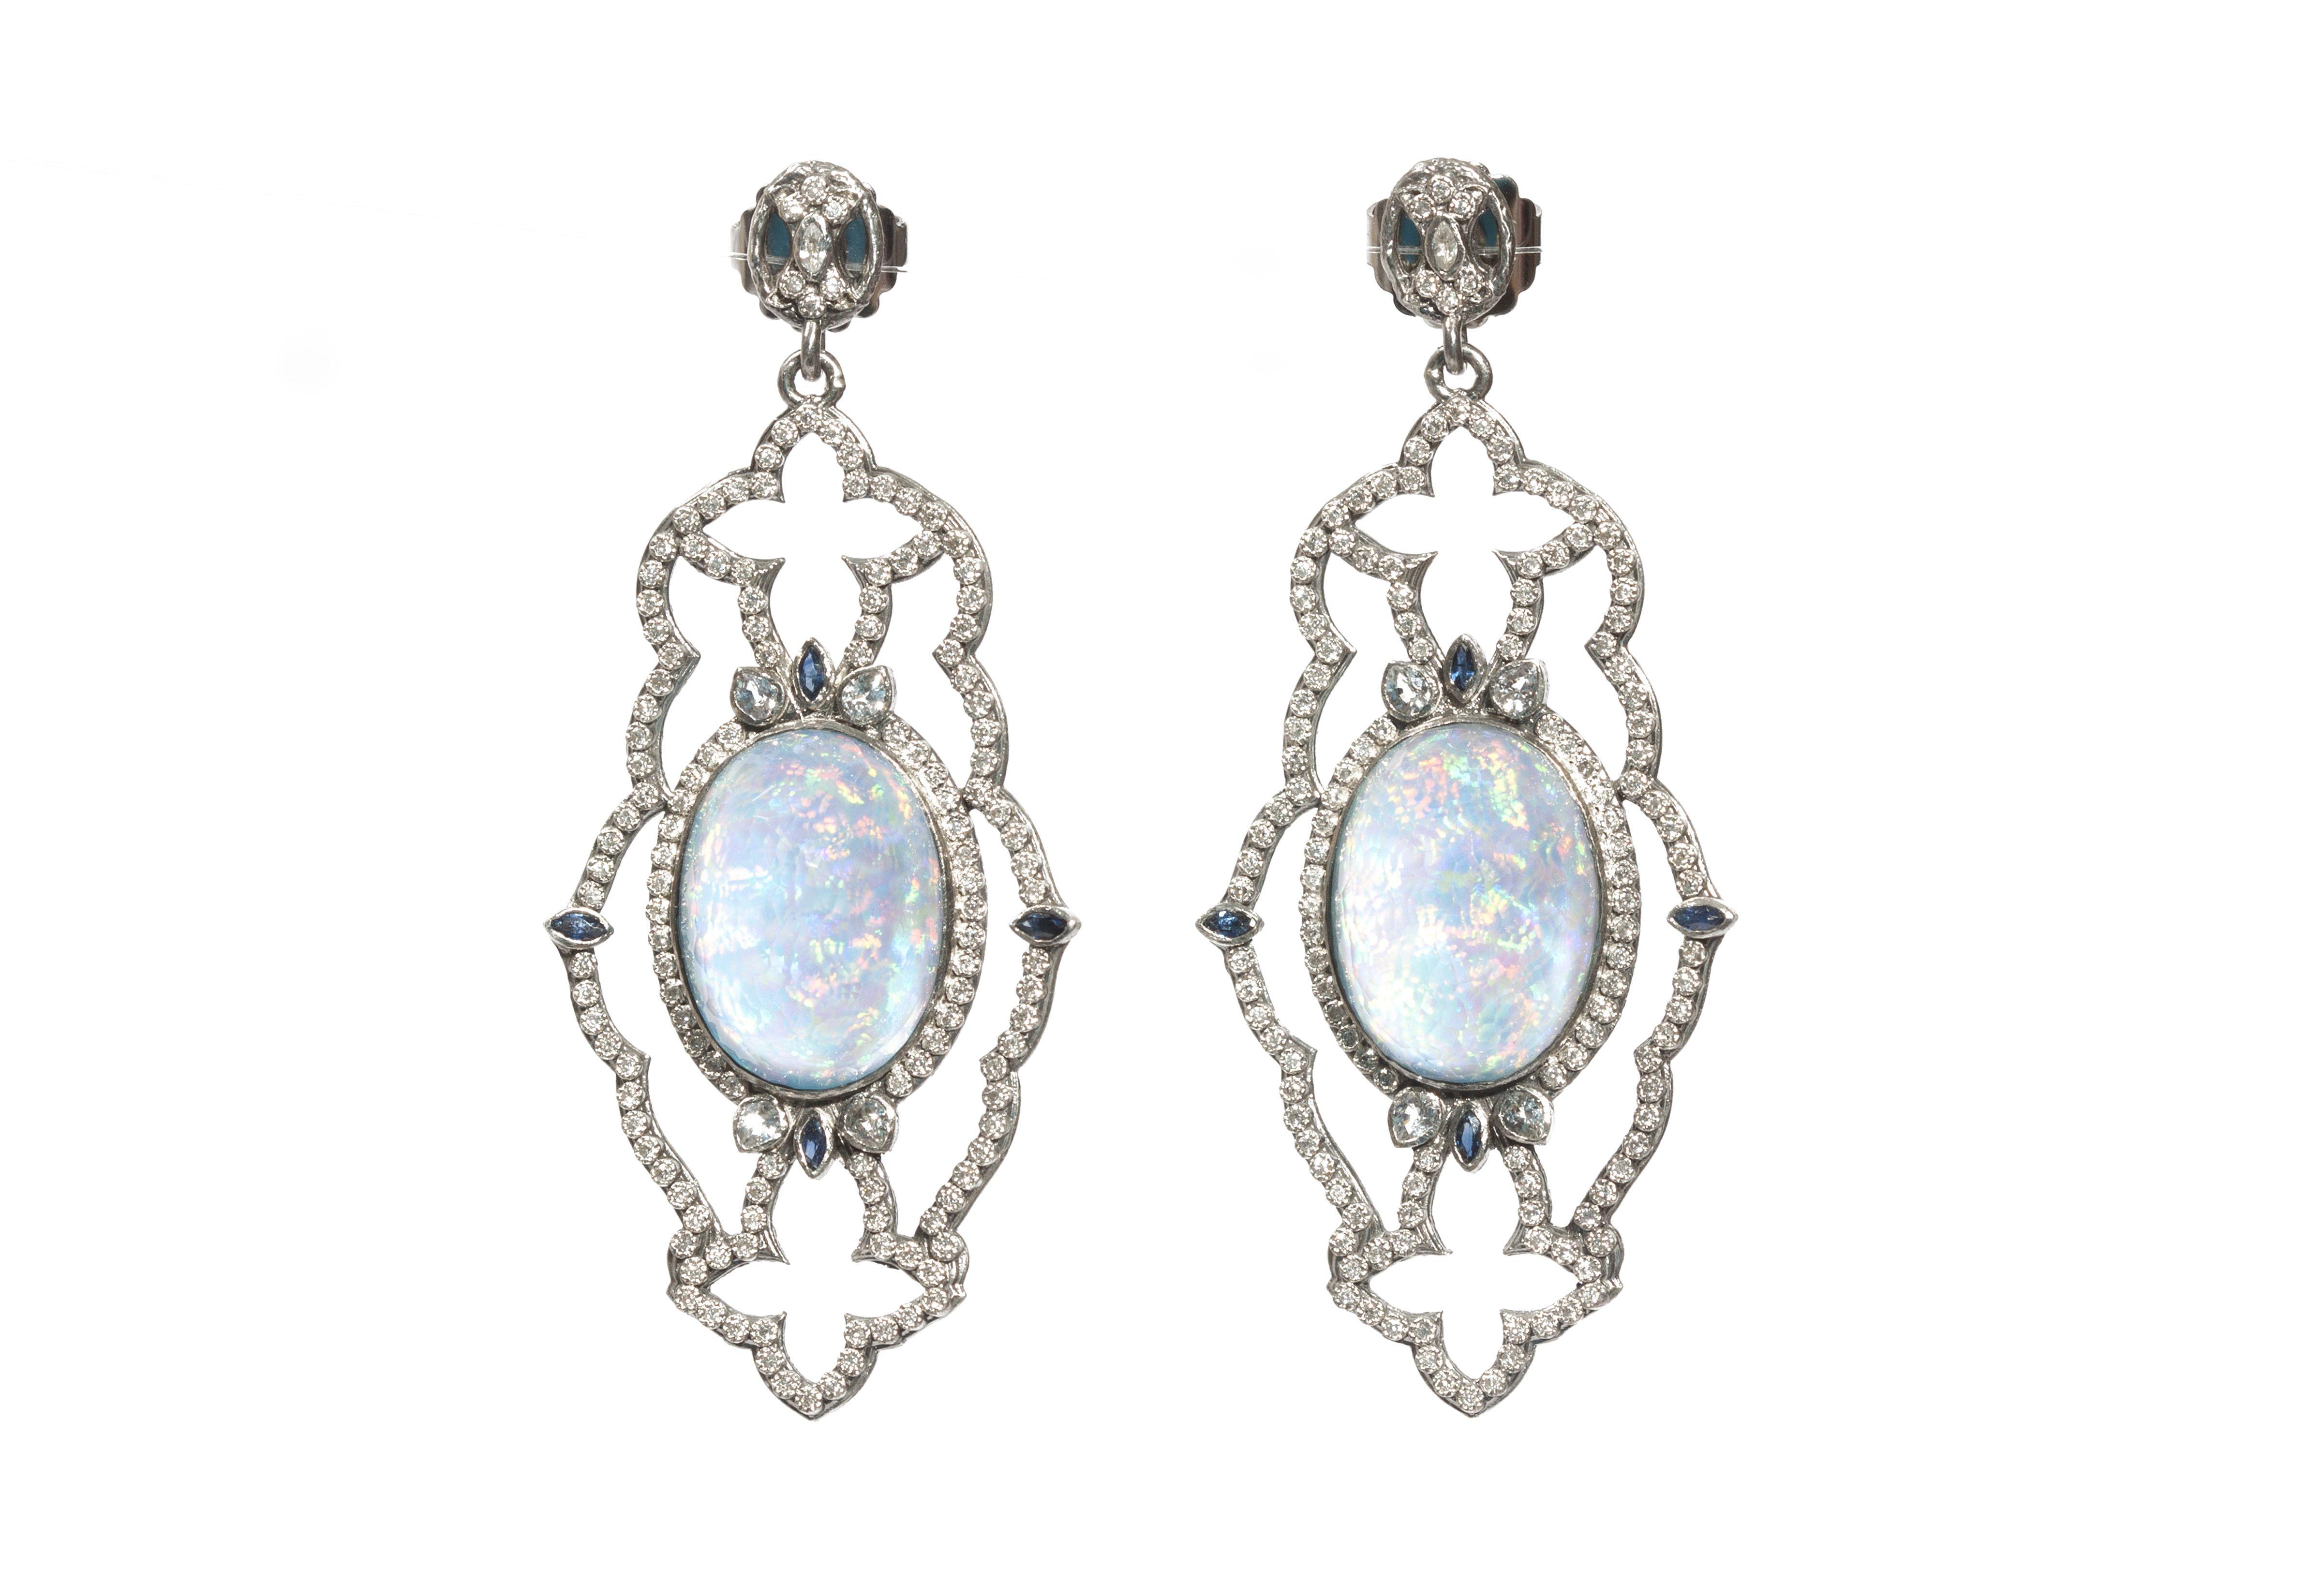 Armenta New World Midnight Scalloped Earrings with Diamonds 5blWh9jCo